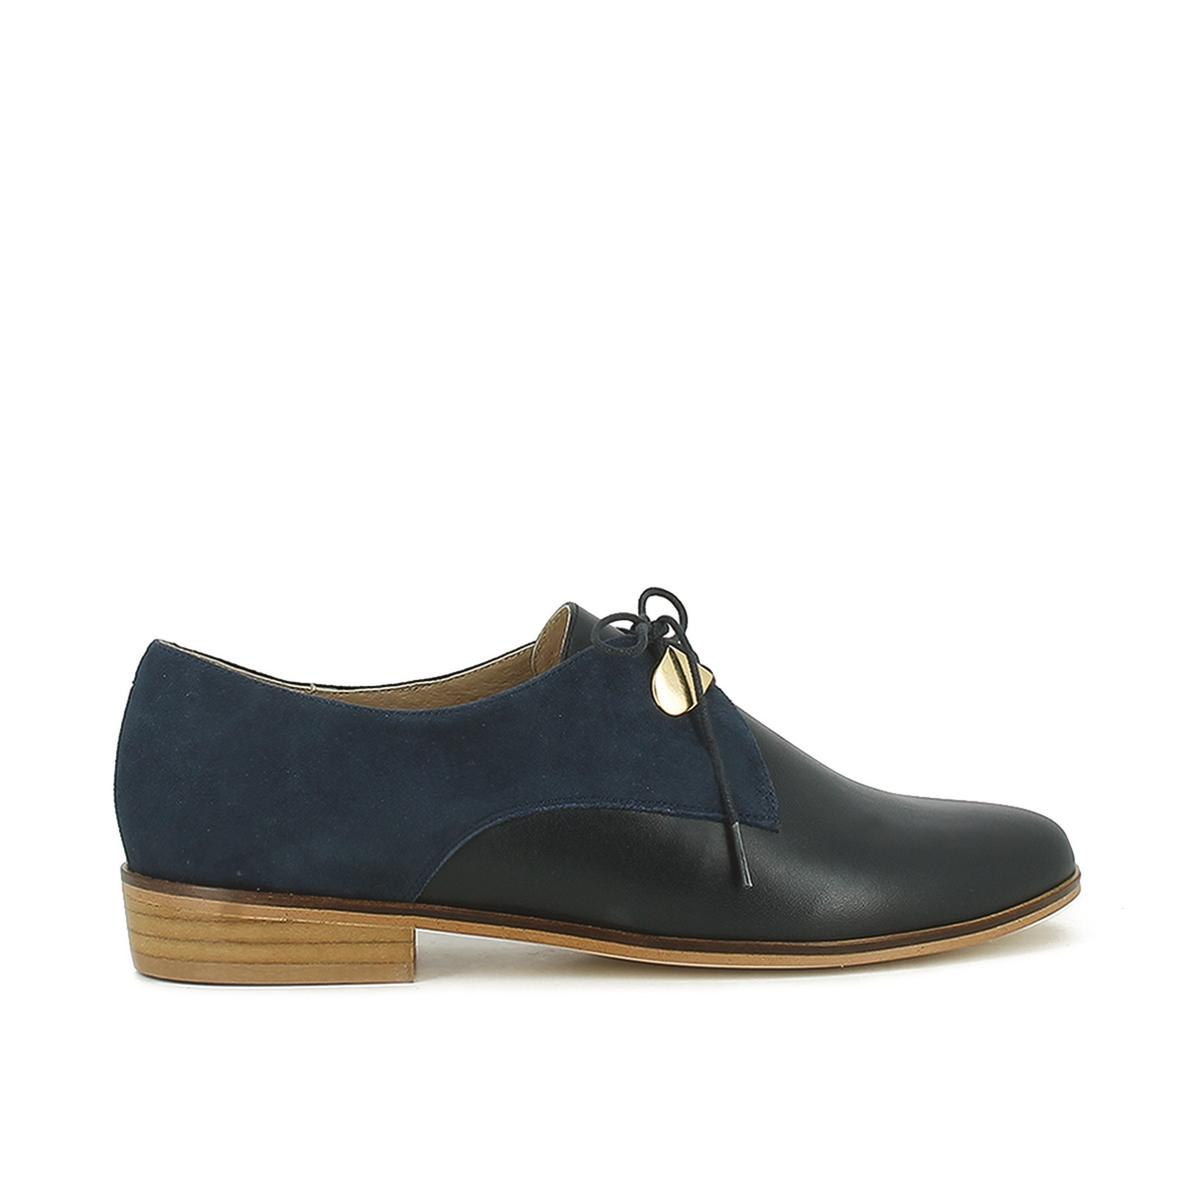 Ботинки-дерби из кожи Divyo ботинки дерби из мягкой кожи takarika